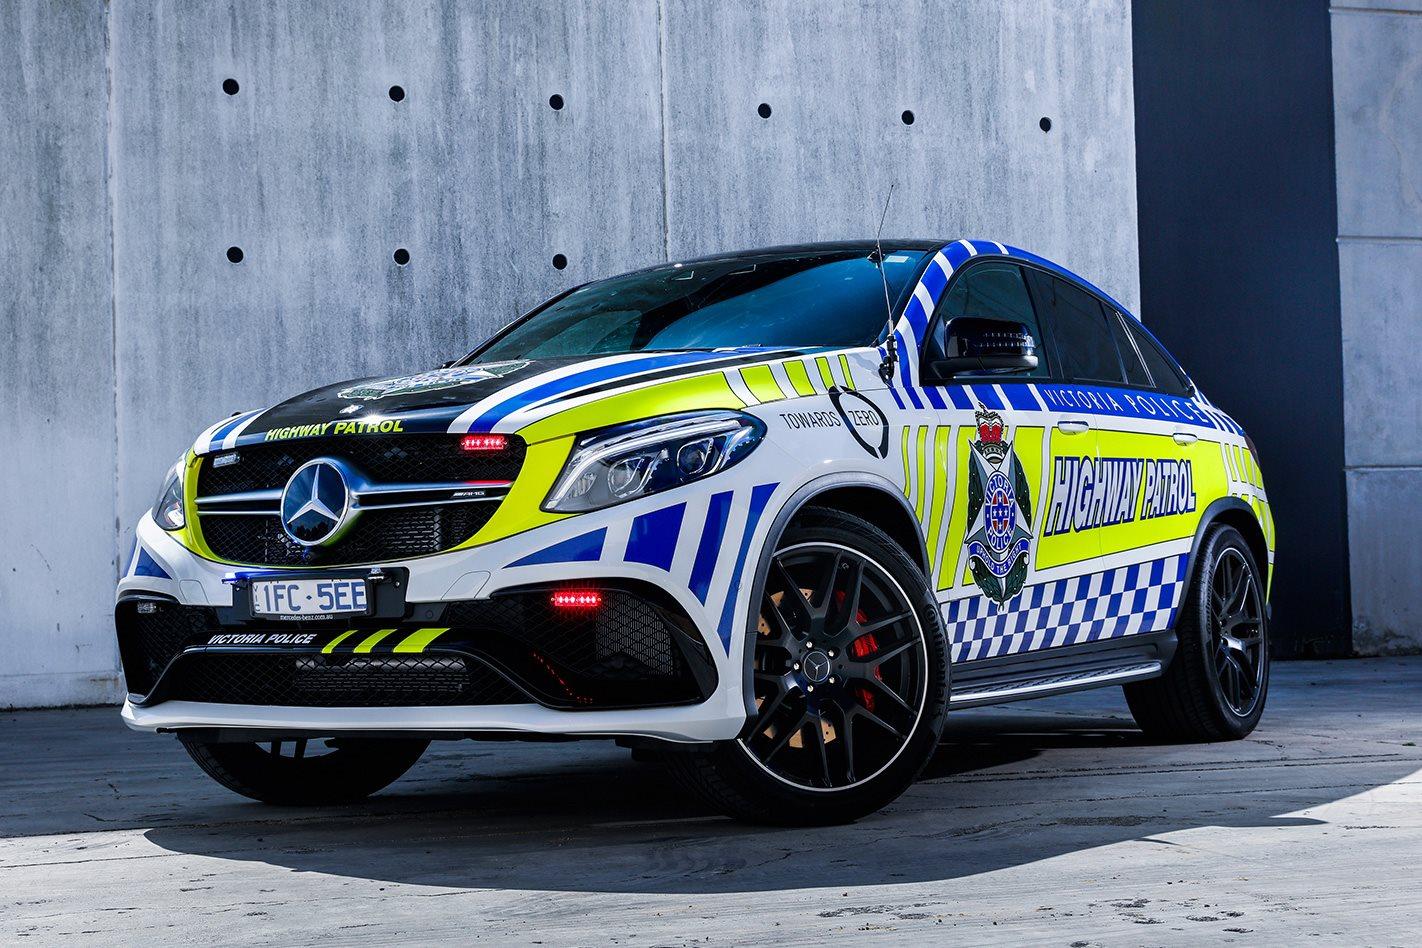 A Mercedes Amg Gle63 Suv Is Australia S Fastest Police Car